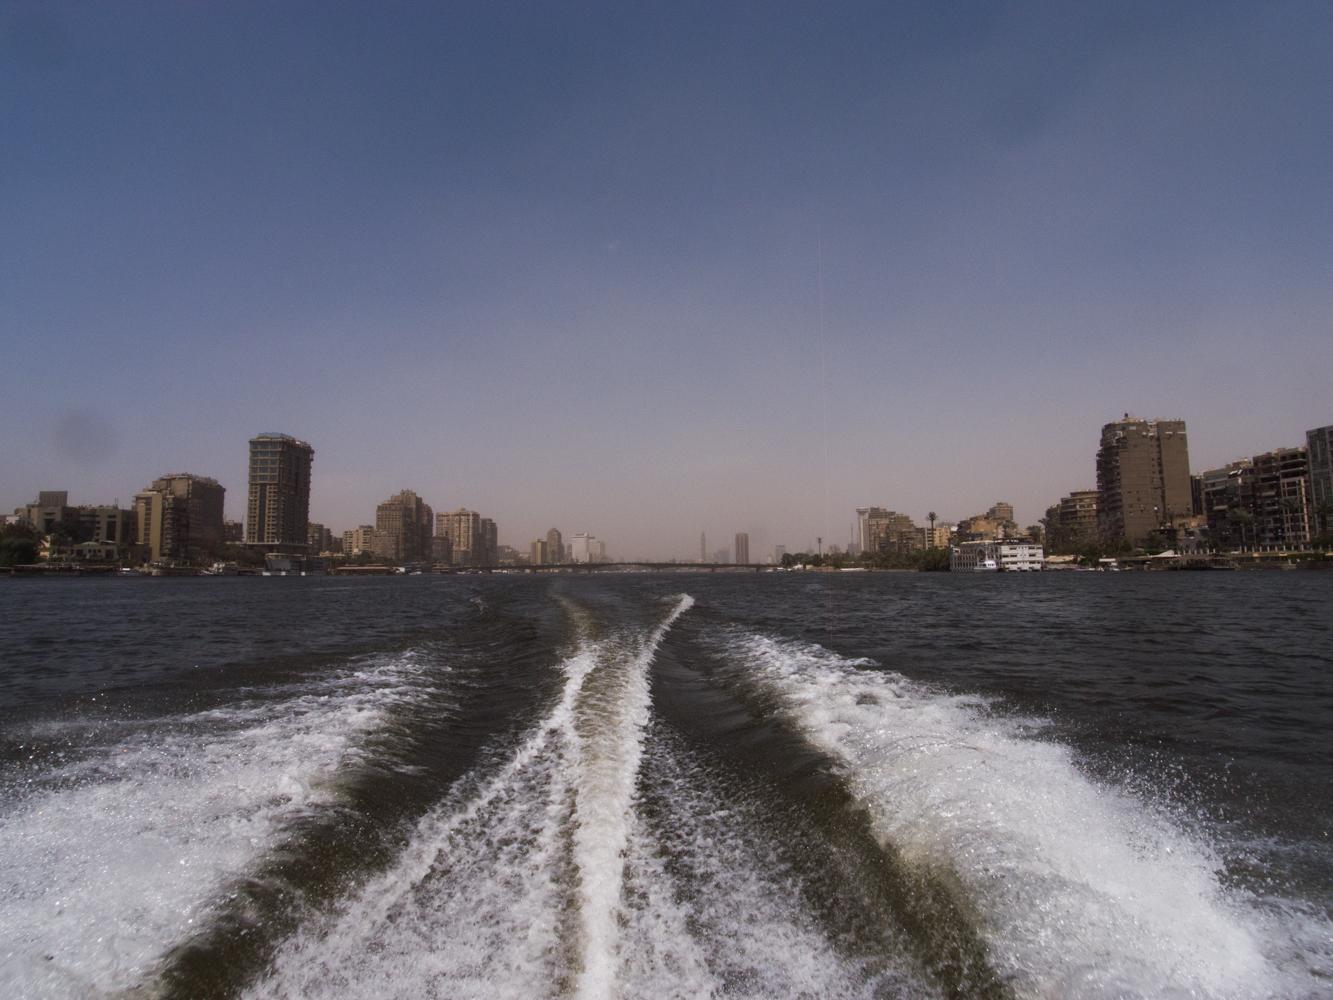 Kairo_Ägypten_City, Nil, Pyramiden